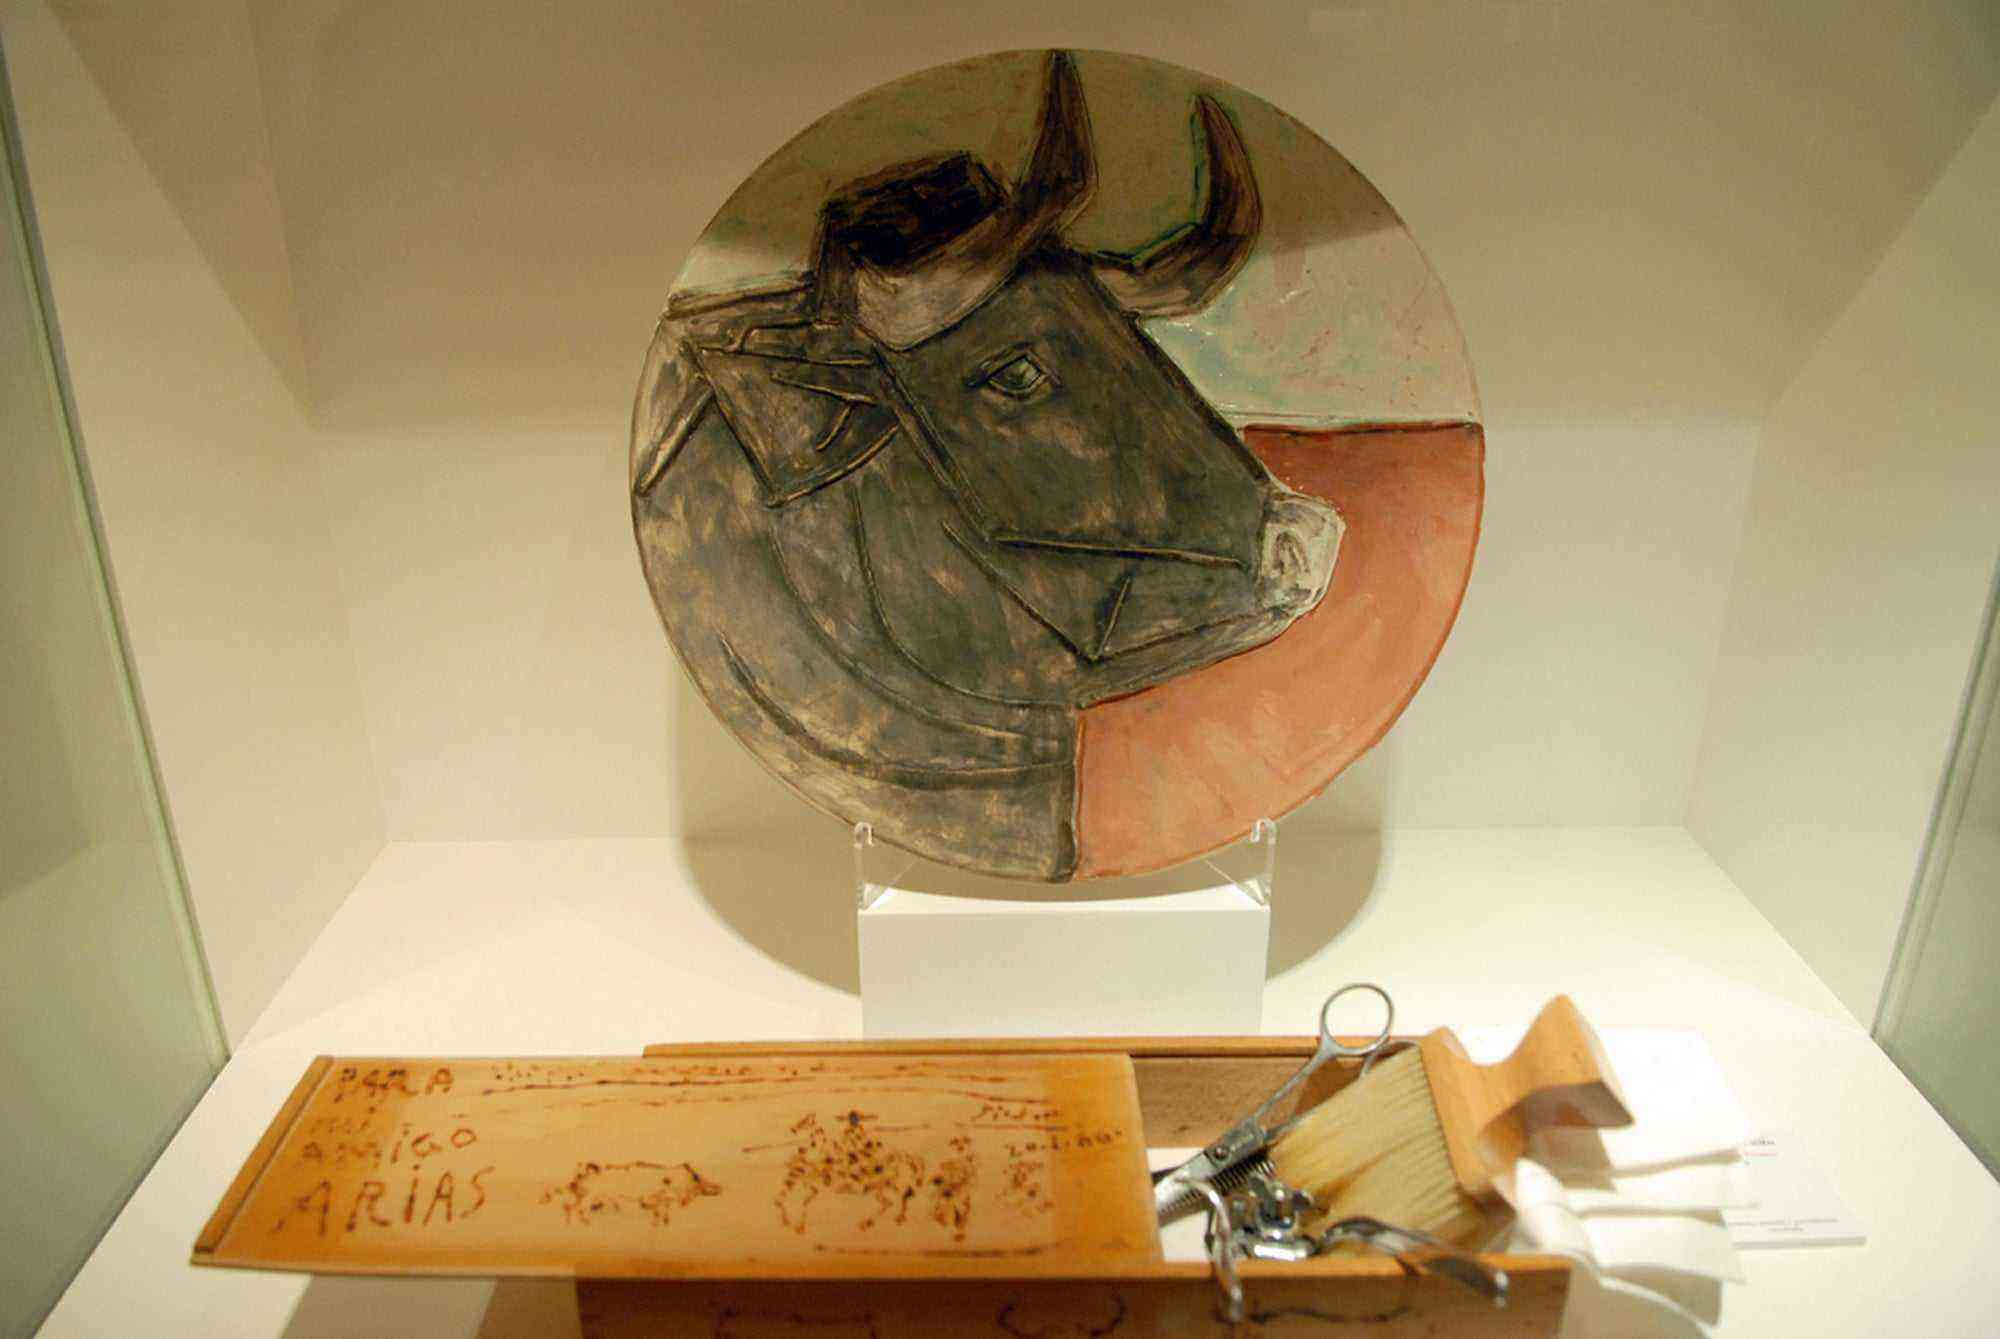 Vitrina Museo Picasso Colecci+¦n Eugenio Arias